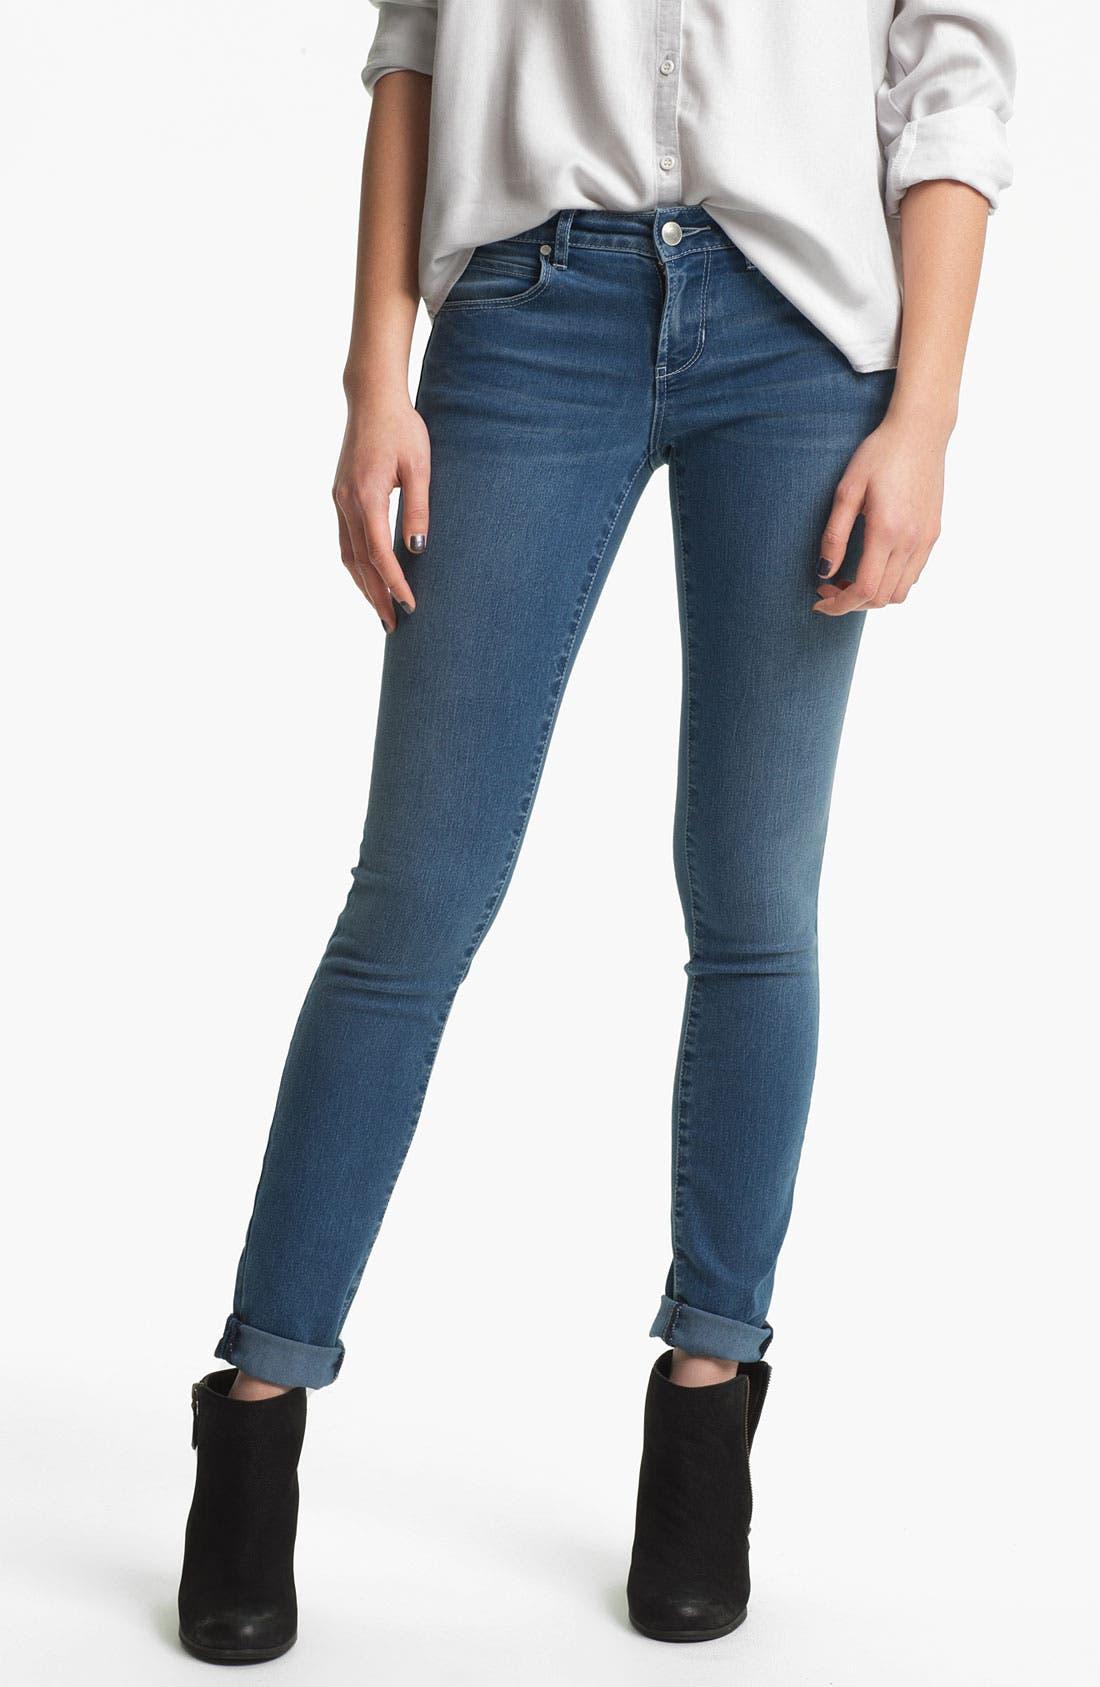 Main Image - Articles of Society 'Mya' Skinny Jeans (Atlantic) (Juniors)